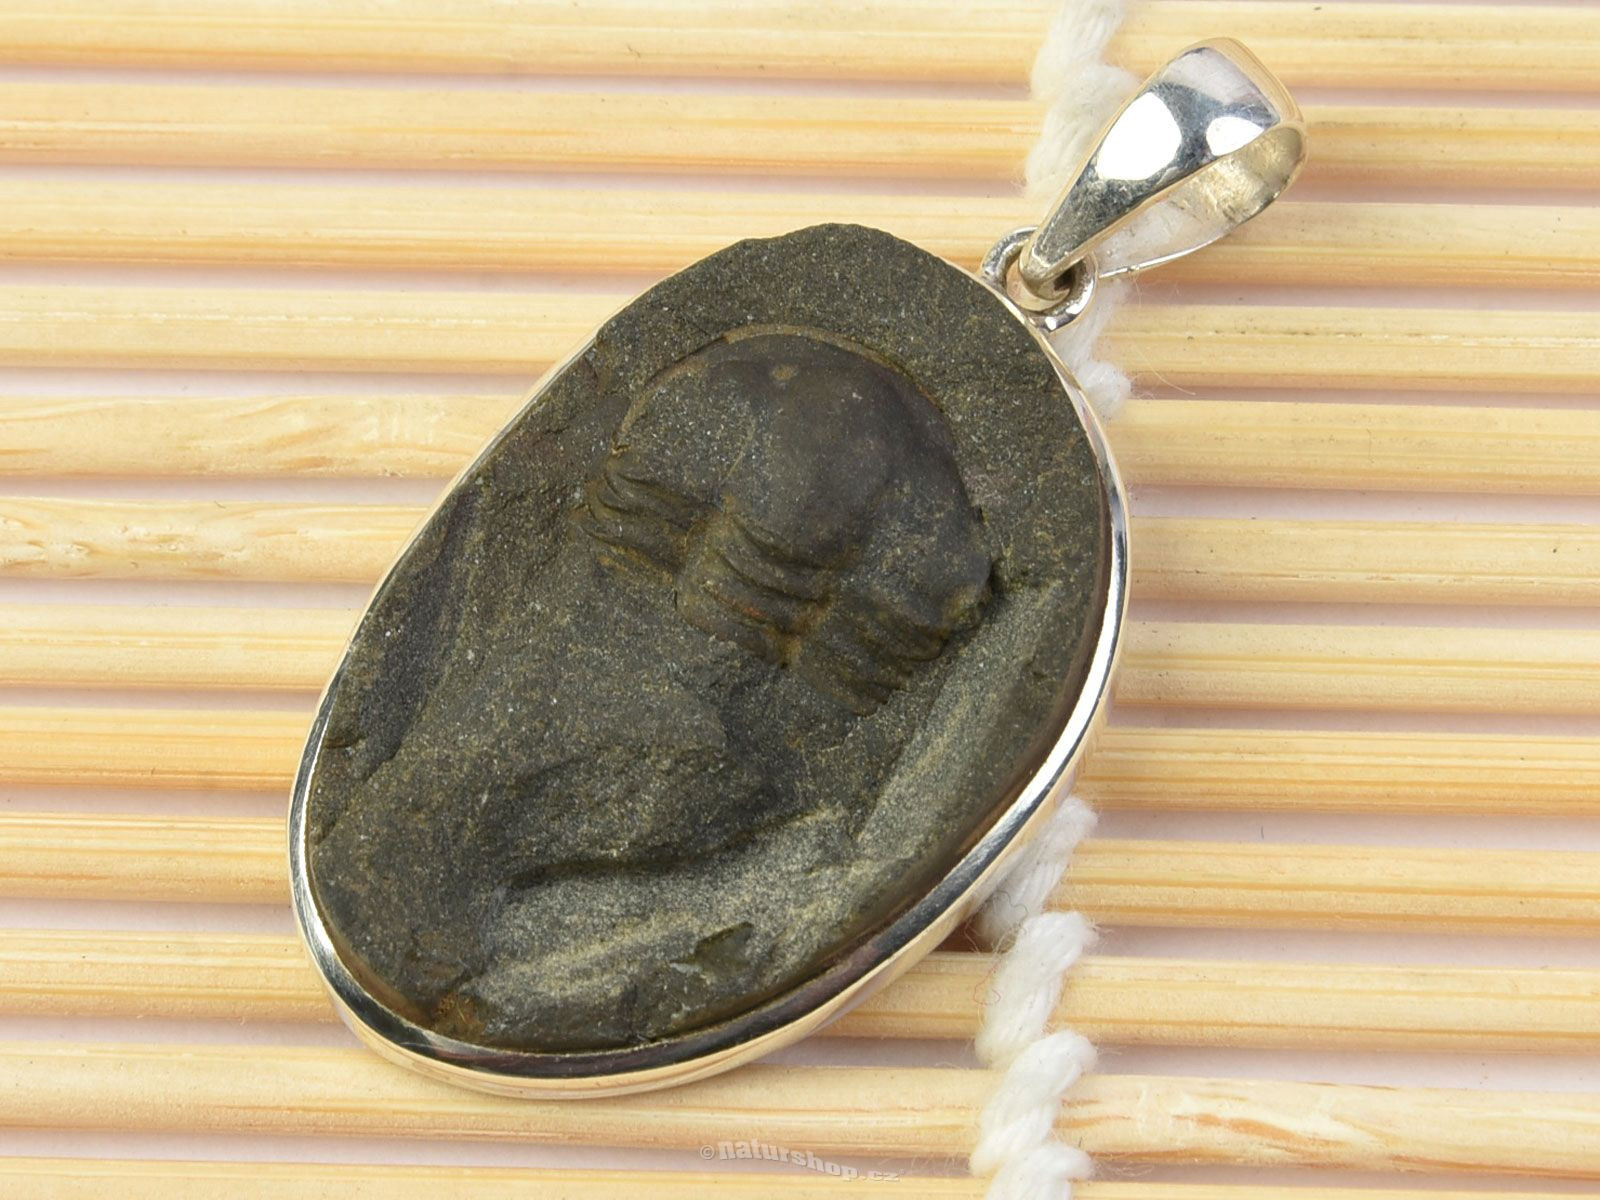 Trilobite pendant silver ag 9251000 67g naturshop trilobite pendant silver ag 9251000 67g mozeypictures Image collections